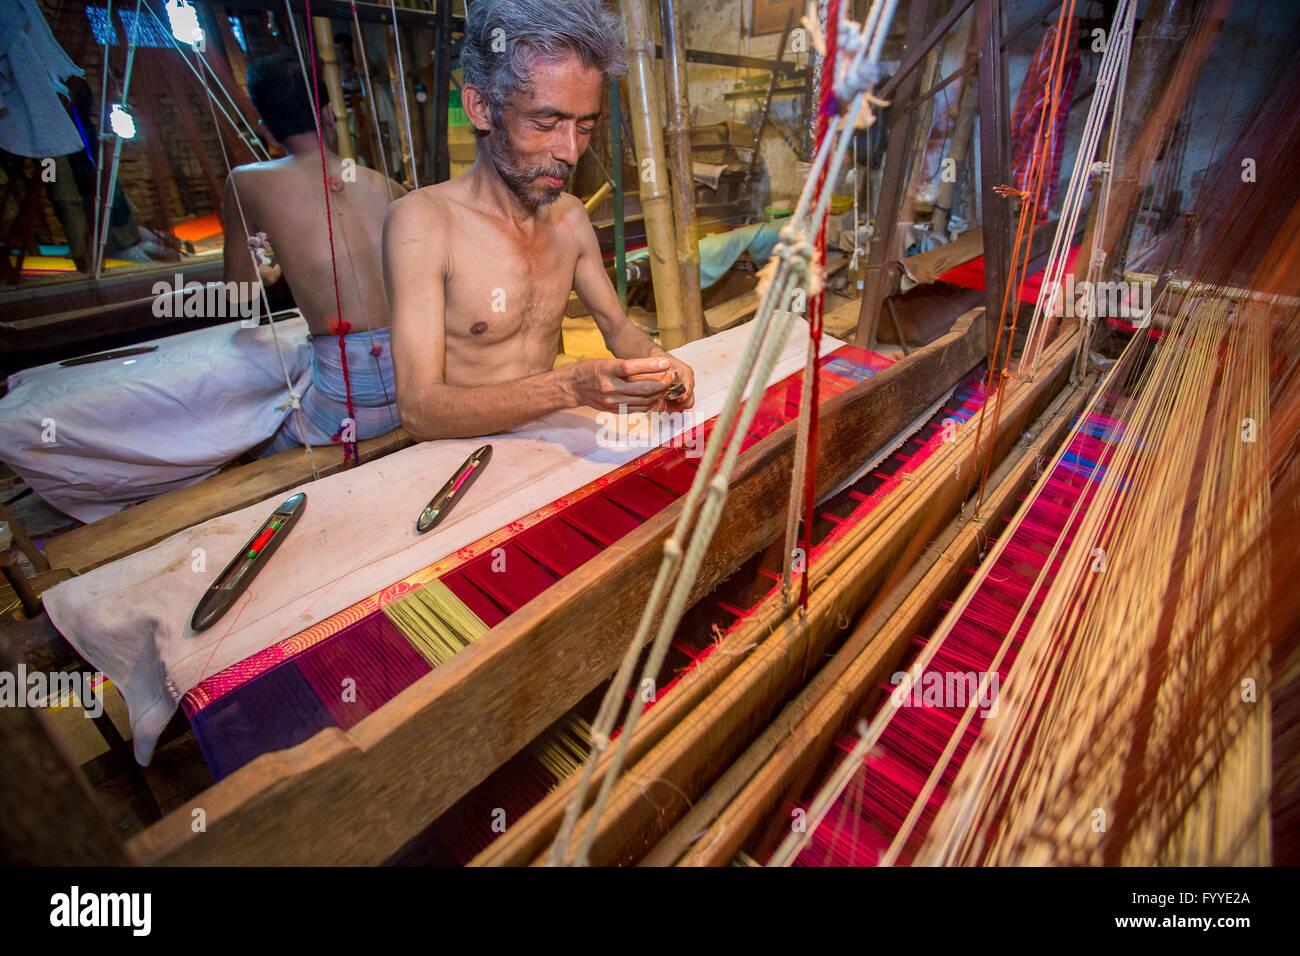 Md. Vola (50 years) a Benarashi Palli worker © Jahangir Alam Onuchcha/Alamy - Stock Image